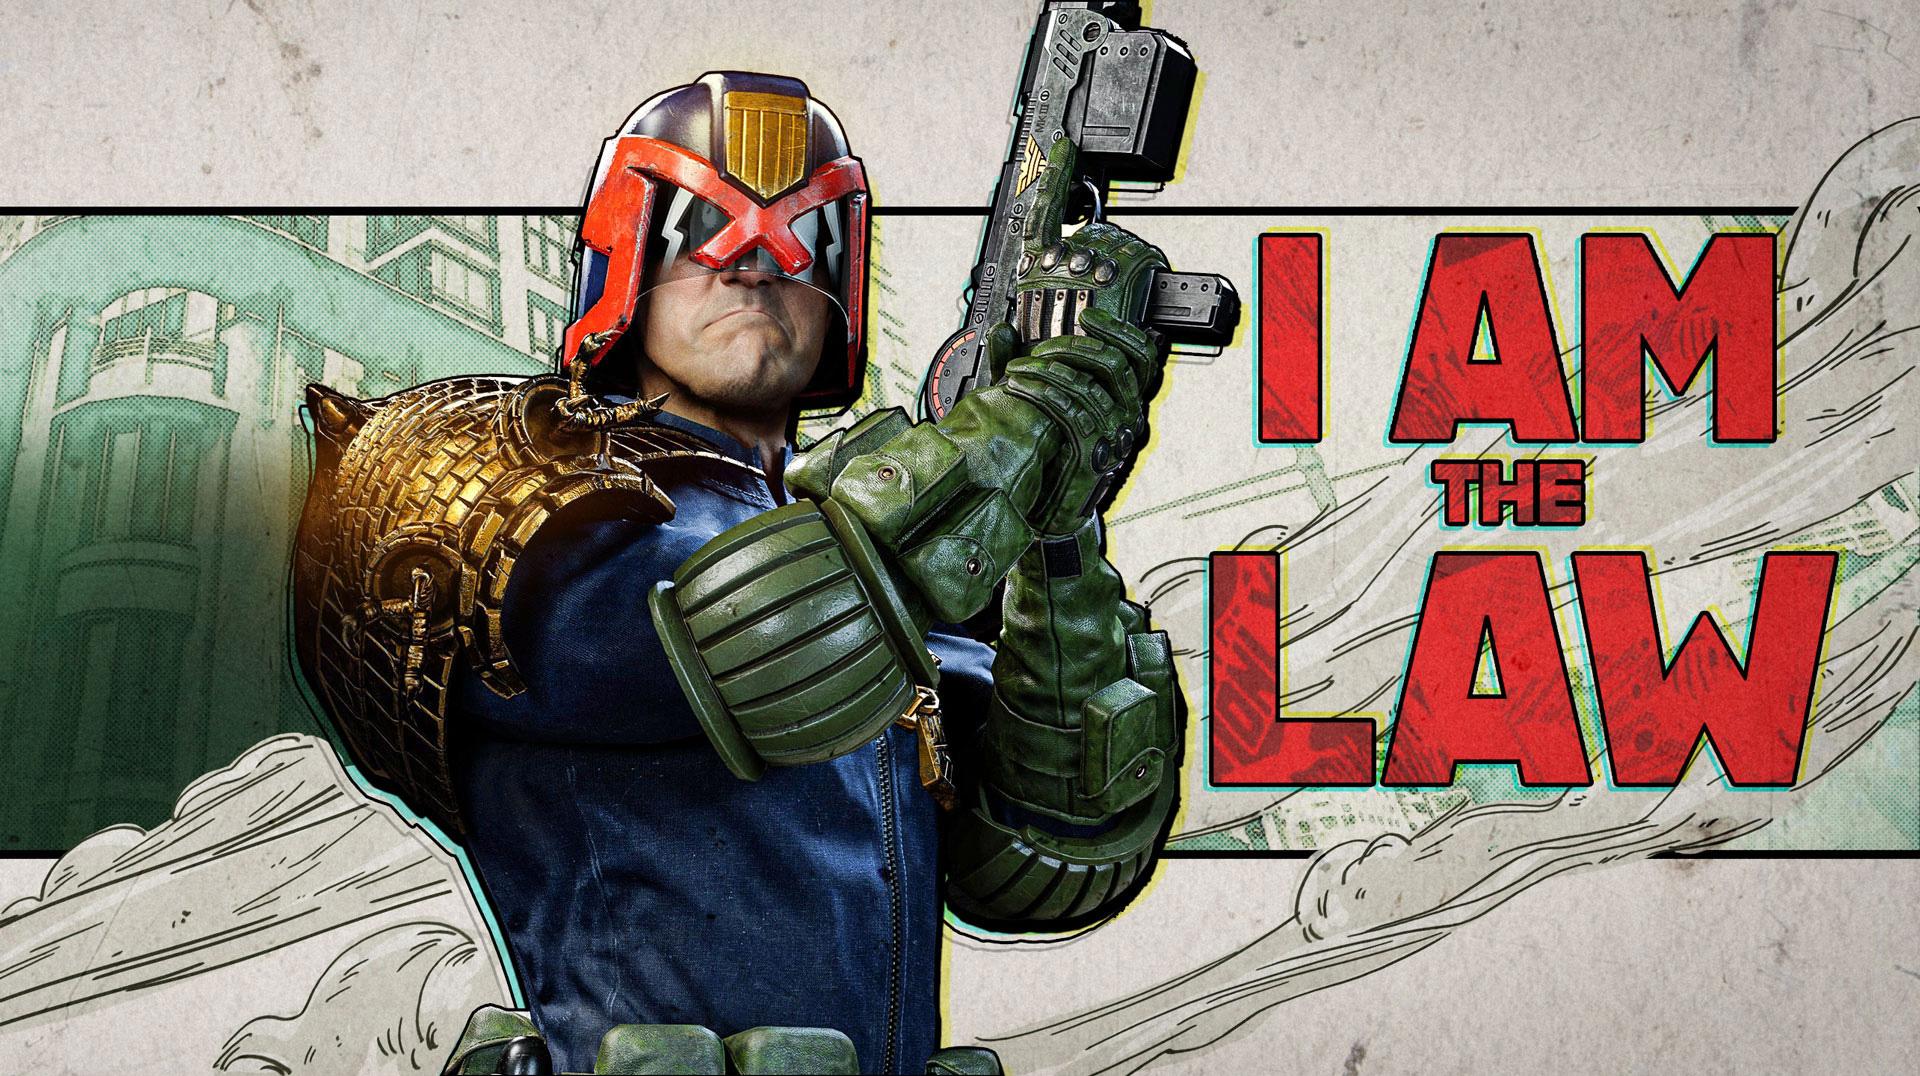 Judge Dredd promotional image in Warzone